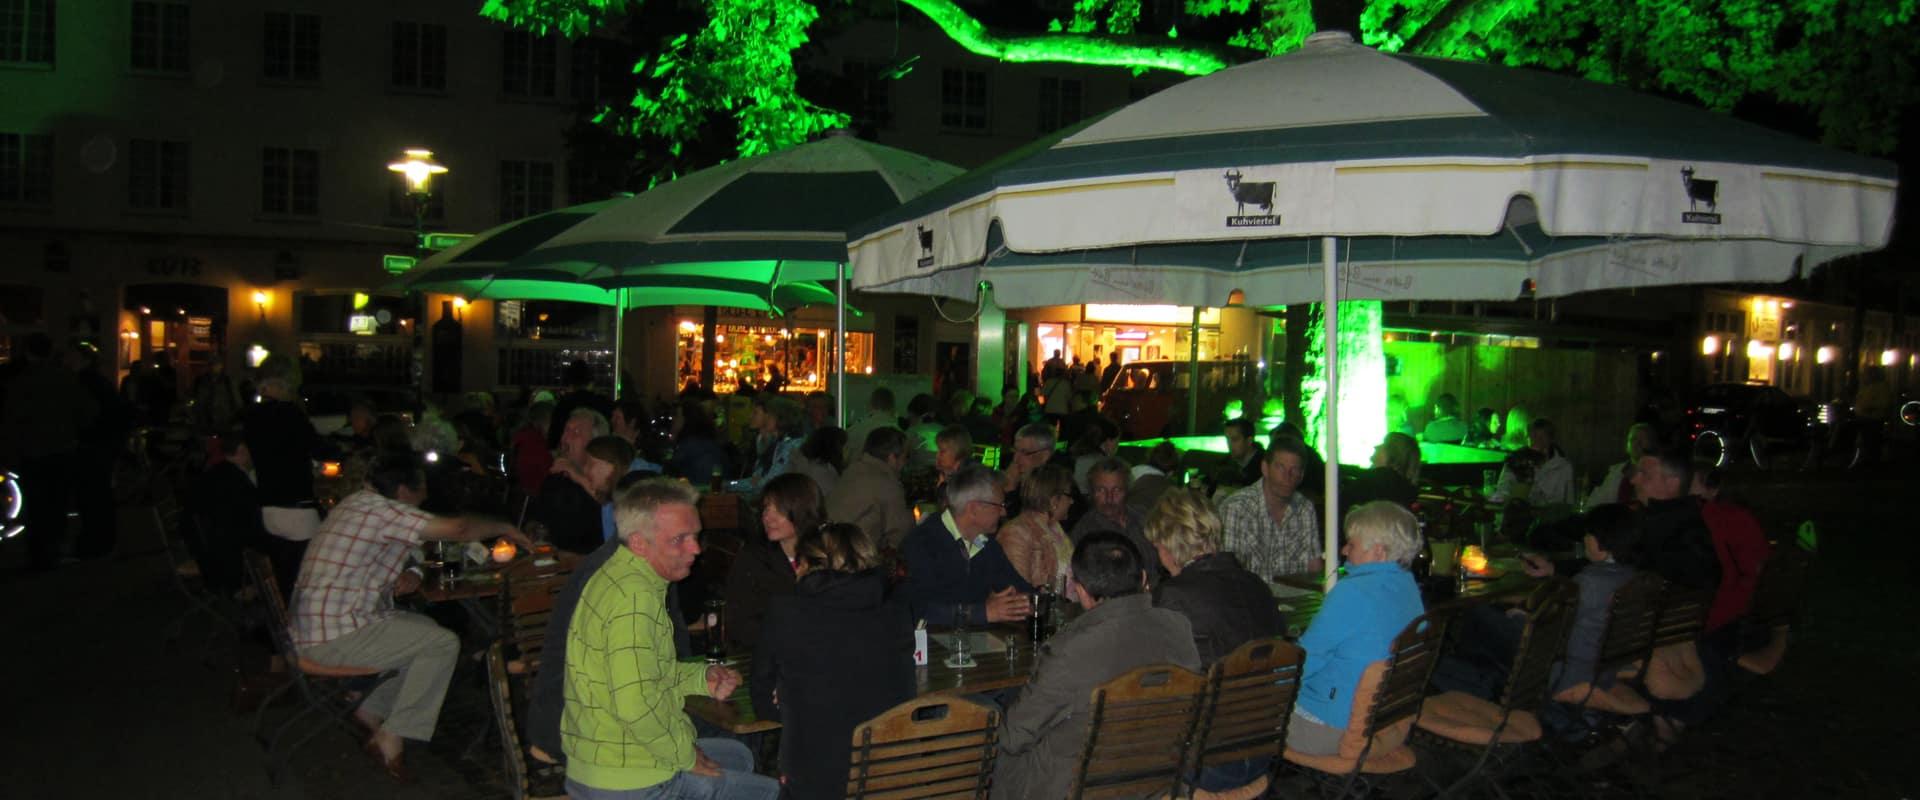 Biergarten am Rosenplatz